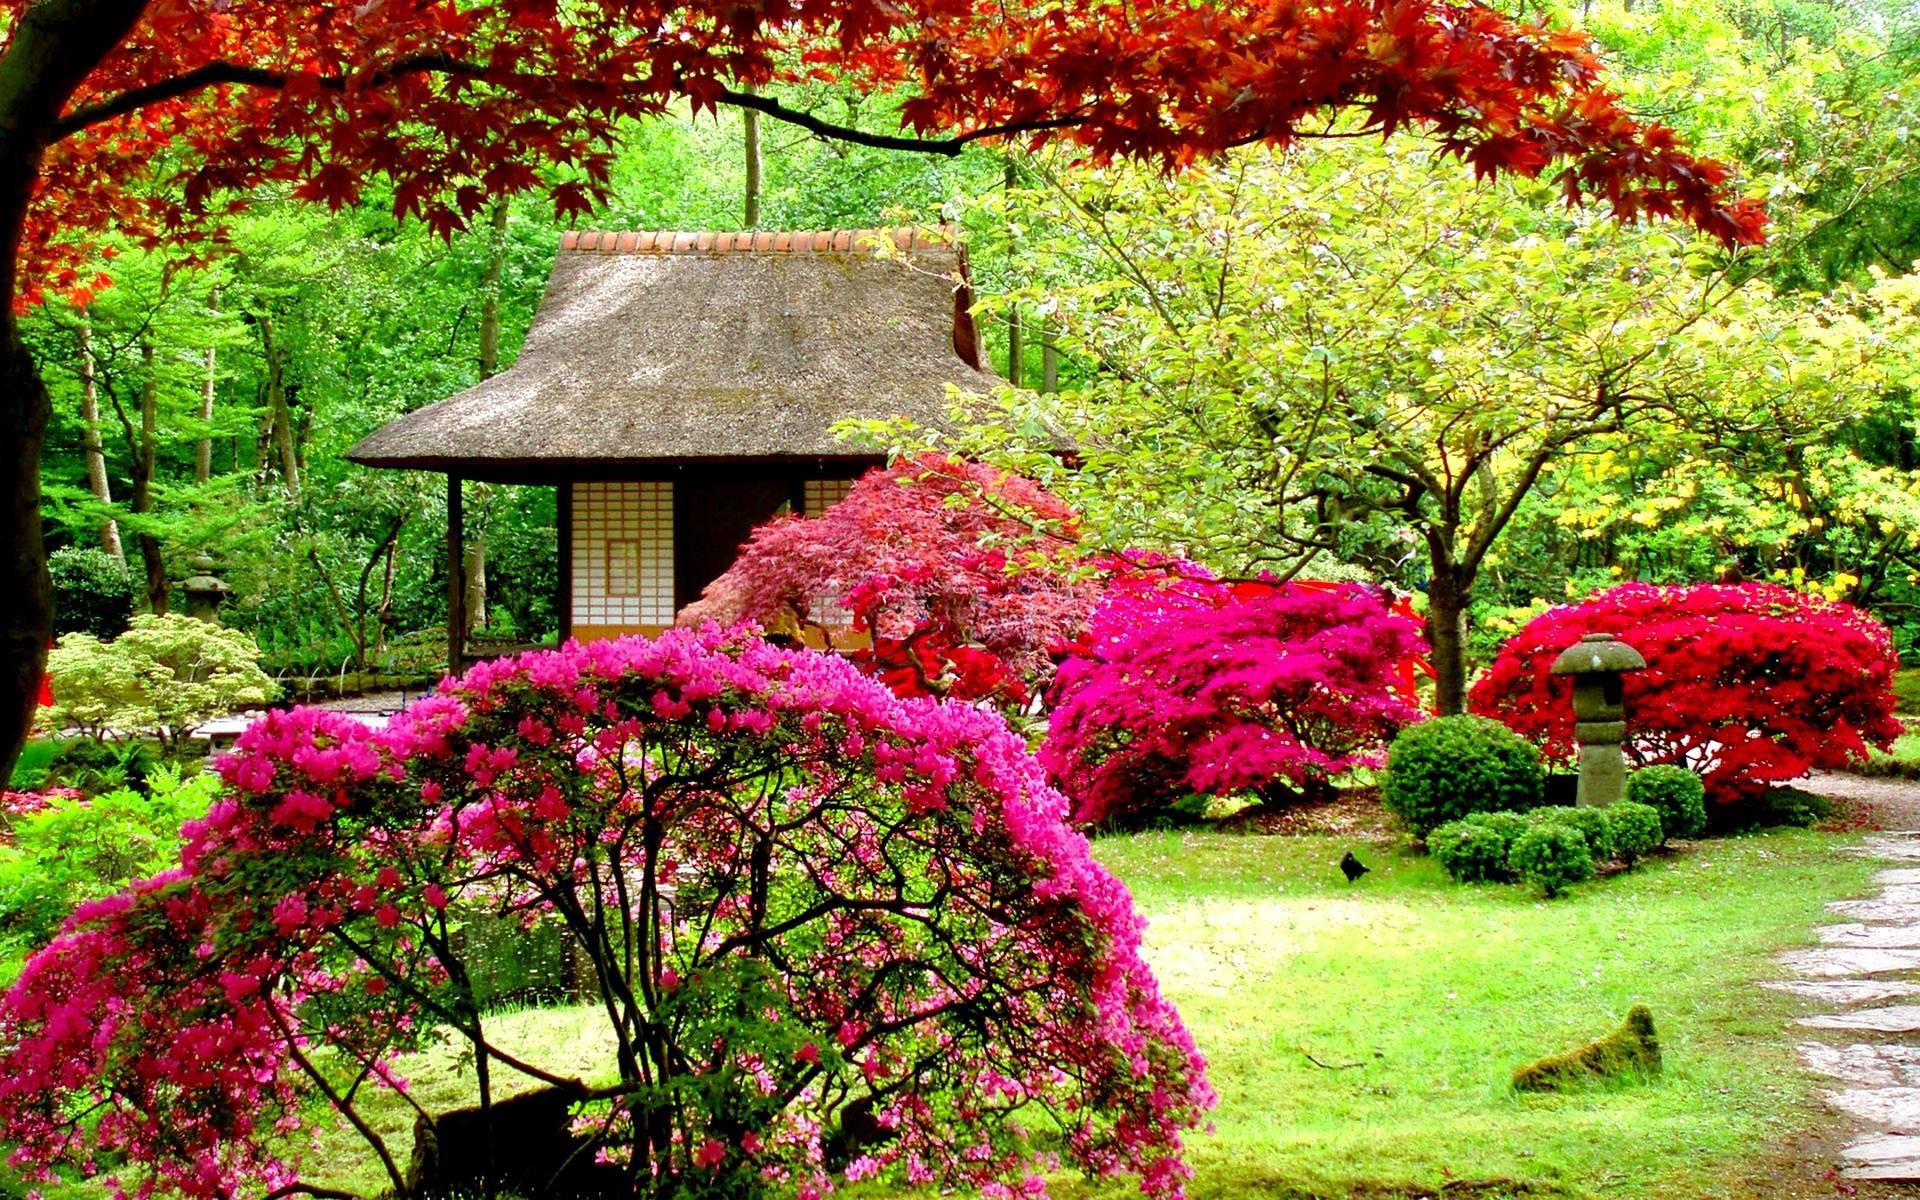 Res: 1920x1200, Flower Garden Wallpapers - Full HD wallpaper search